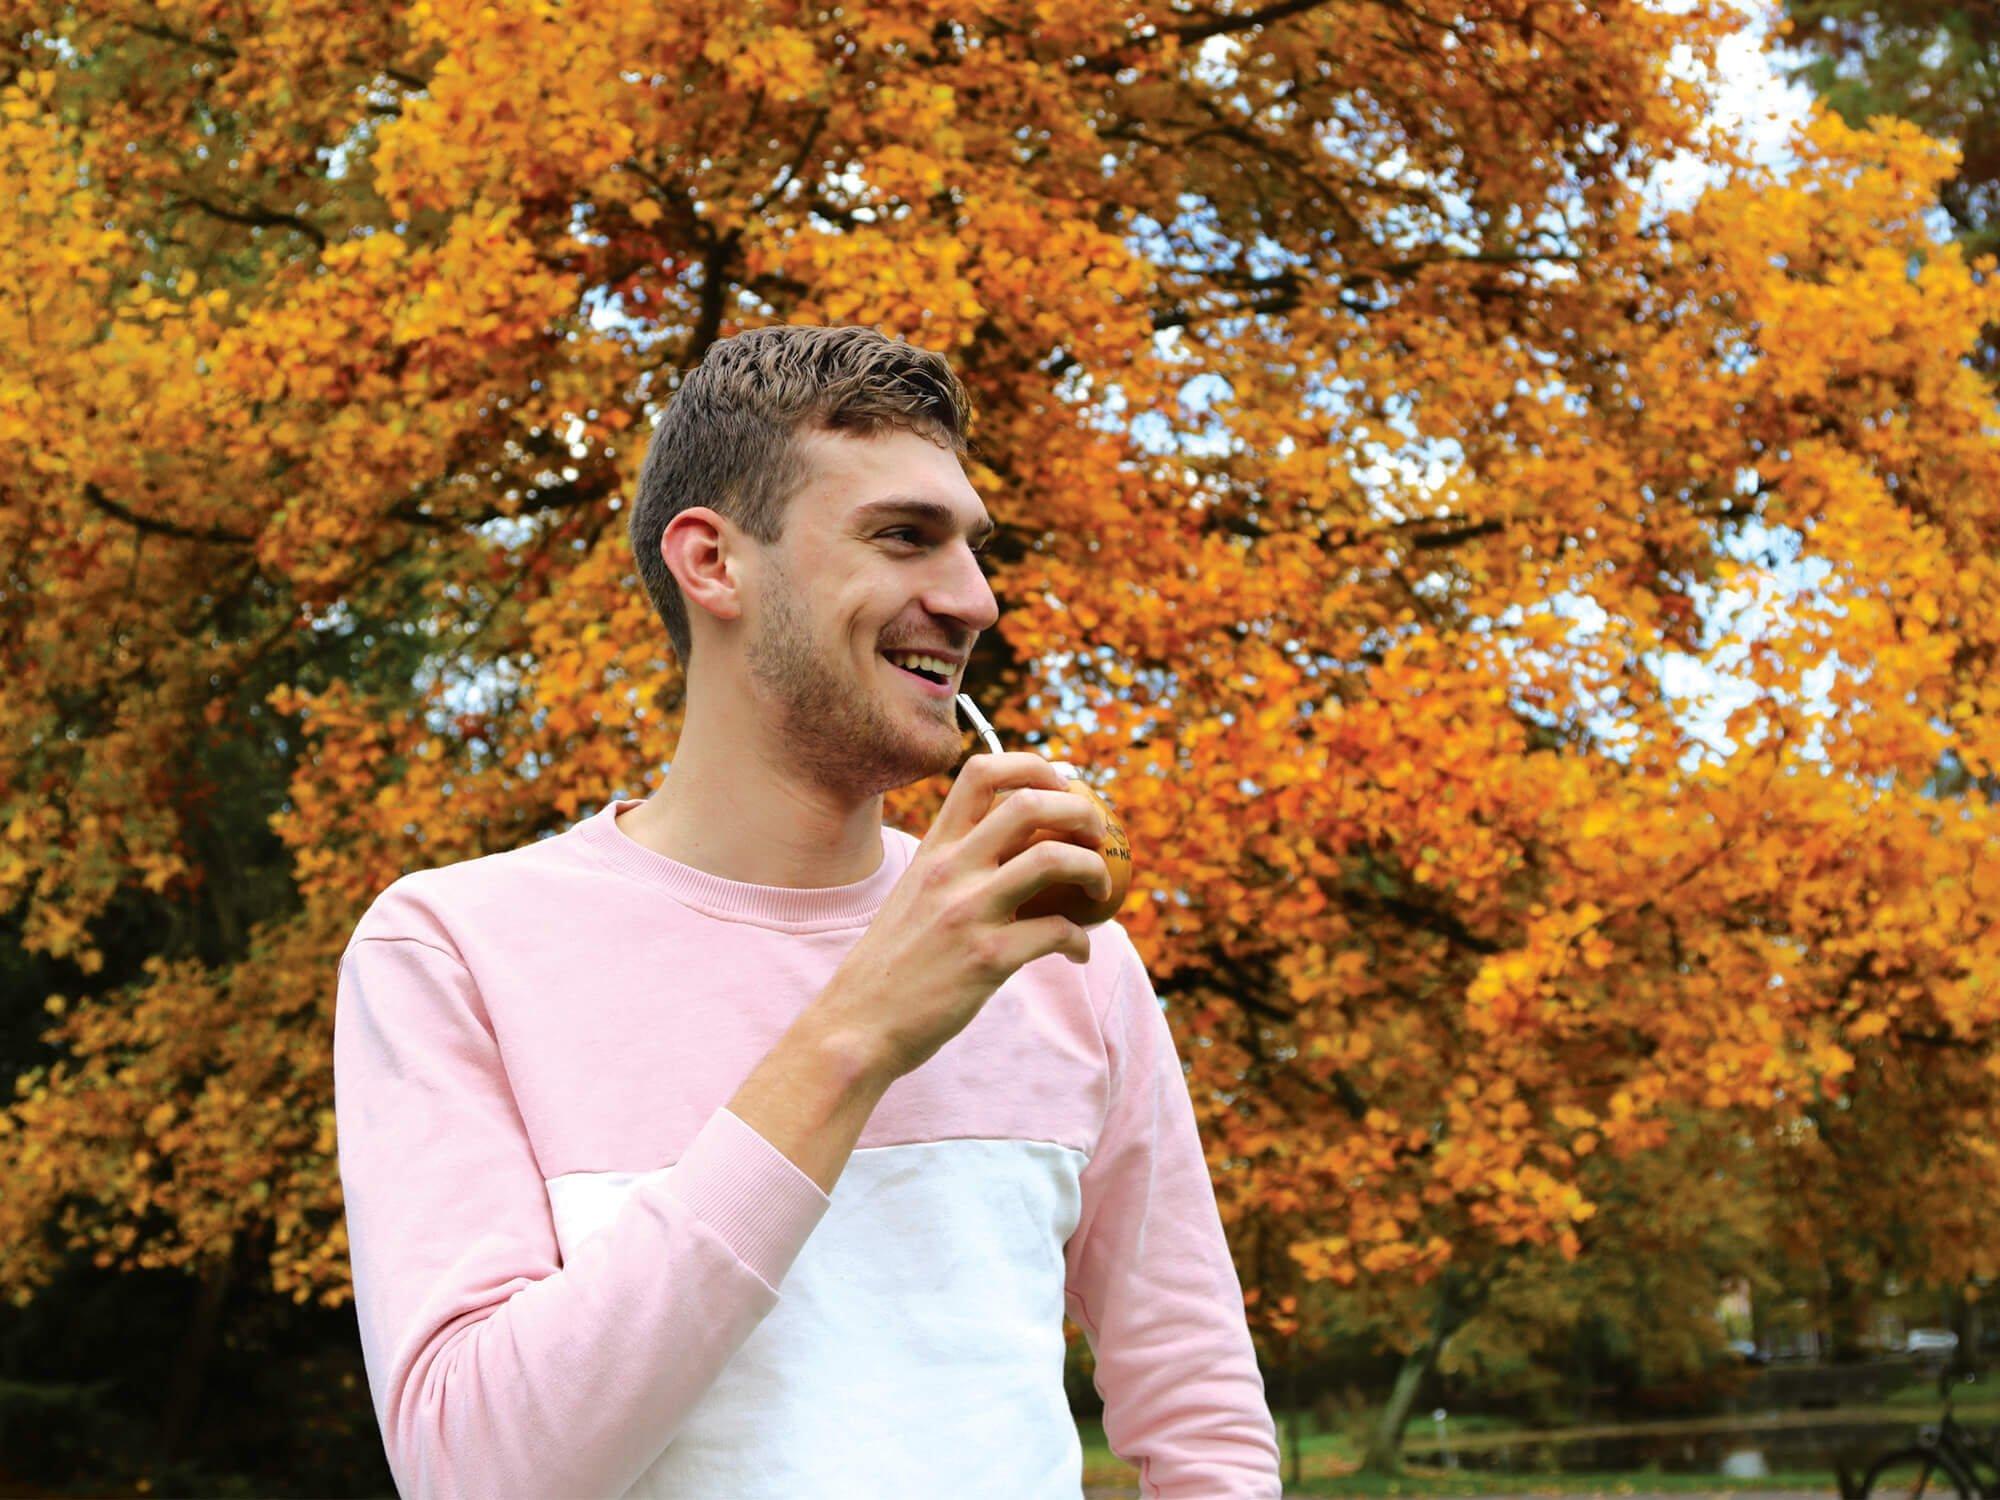 yerba mate drinken herfst lekker